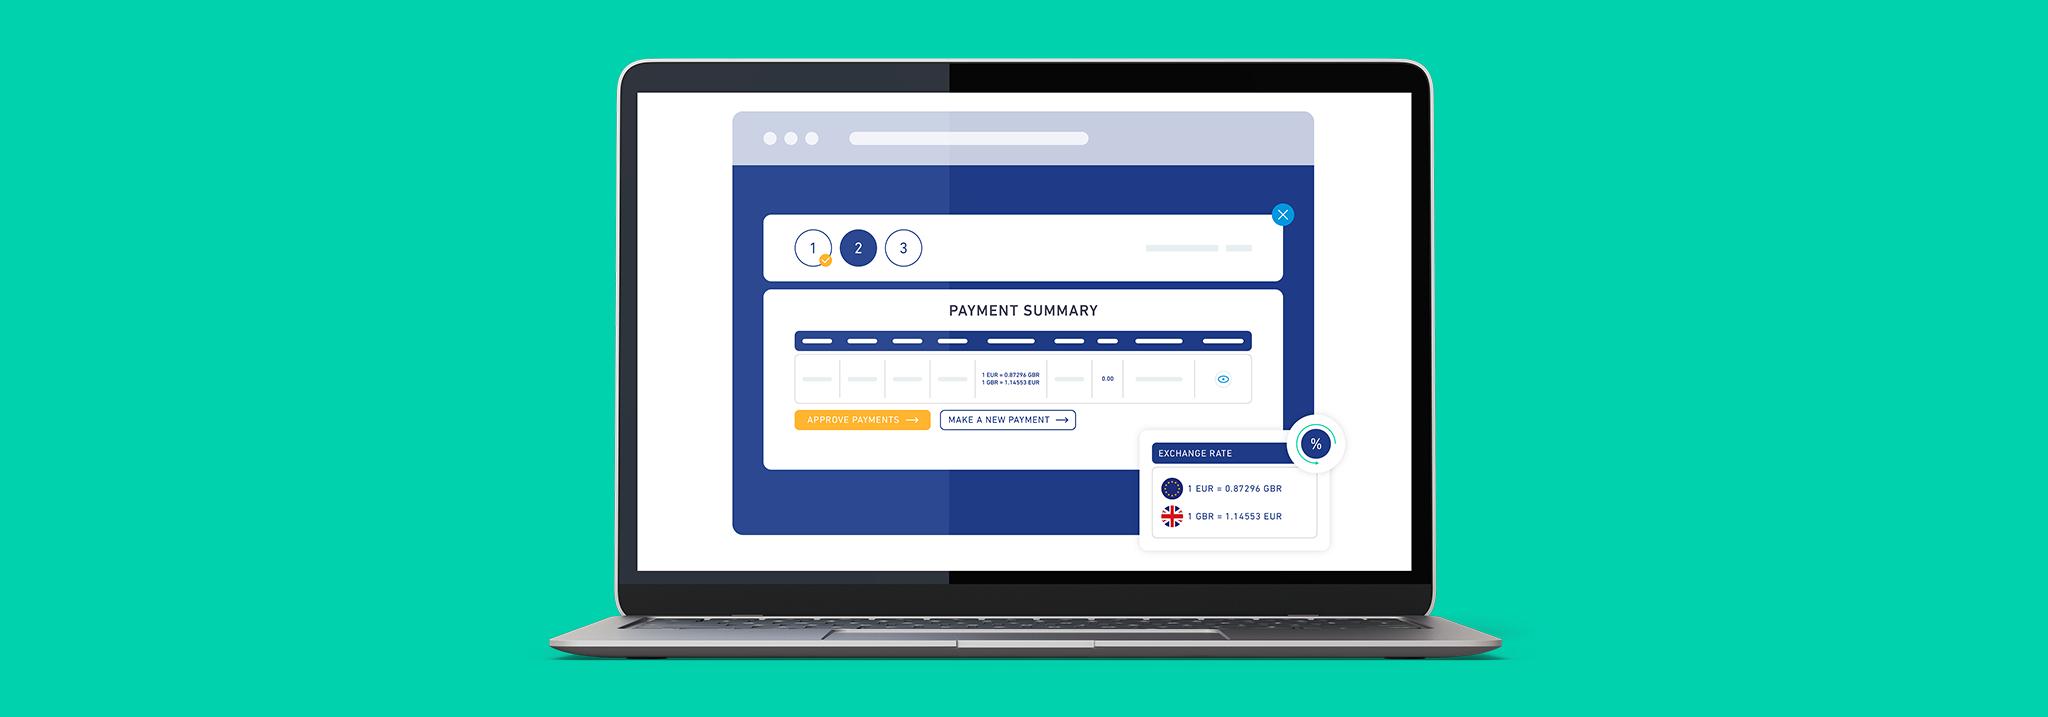 TransferMate Product Spotlight May 2021